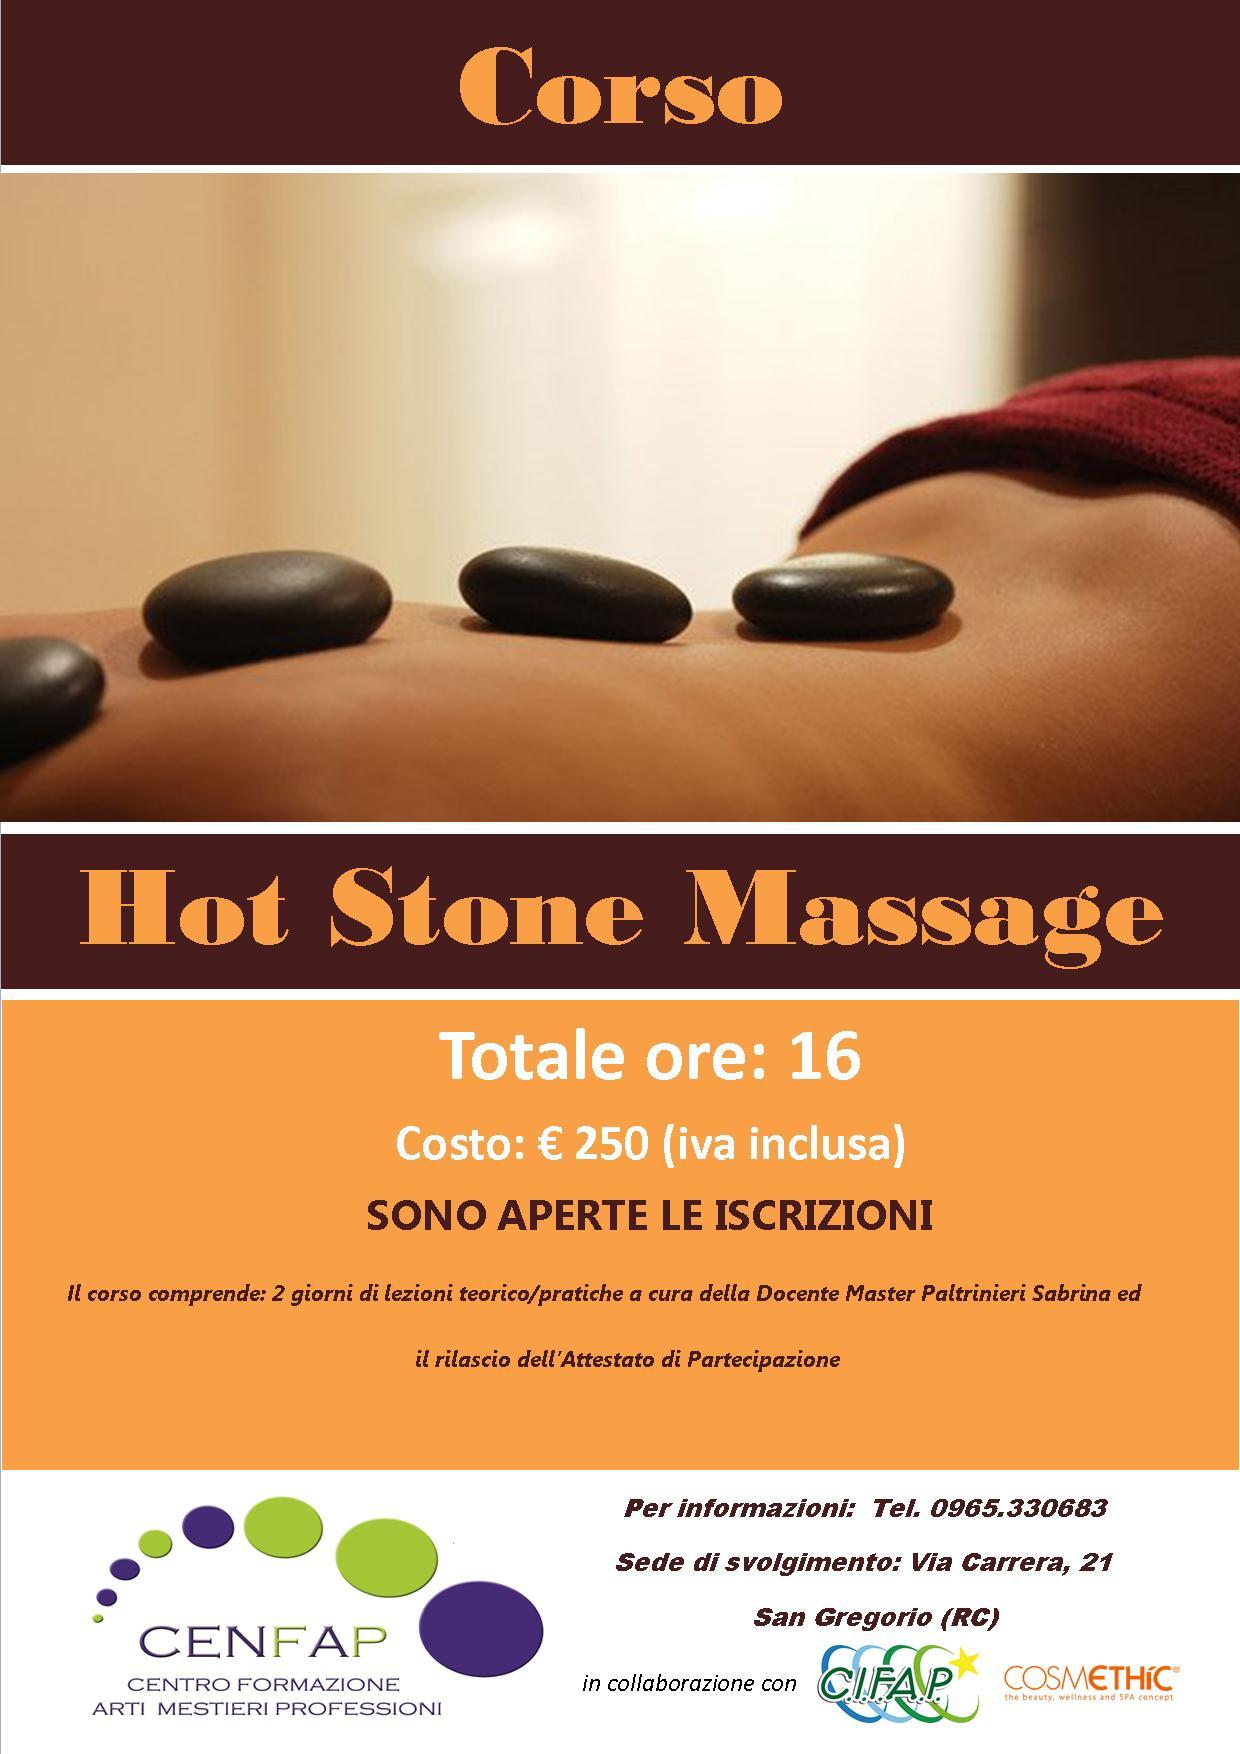 Corso-Hot-Stone-Massage